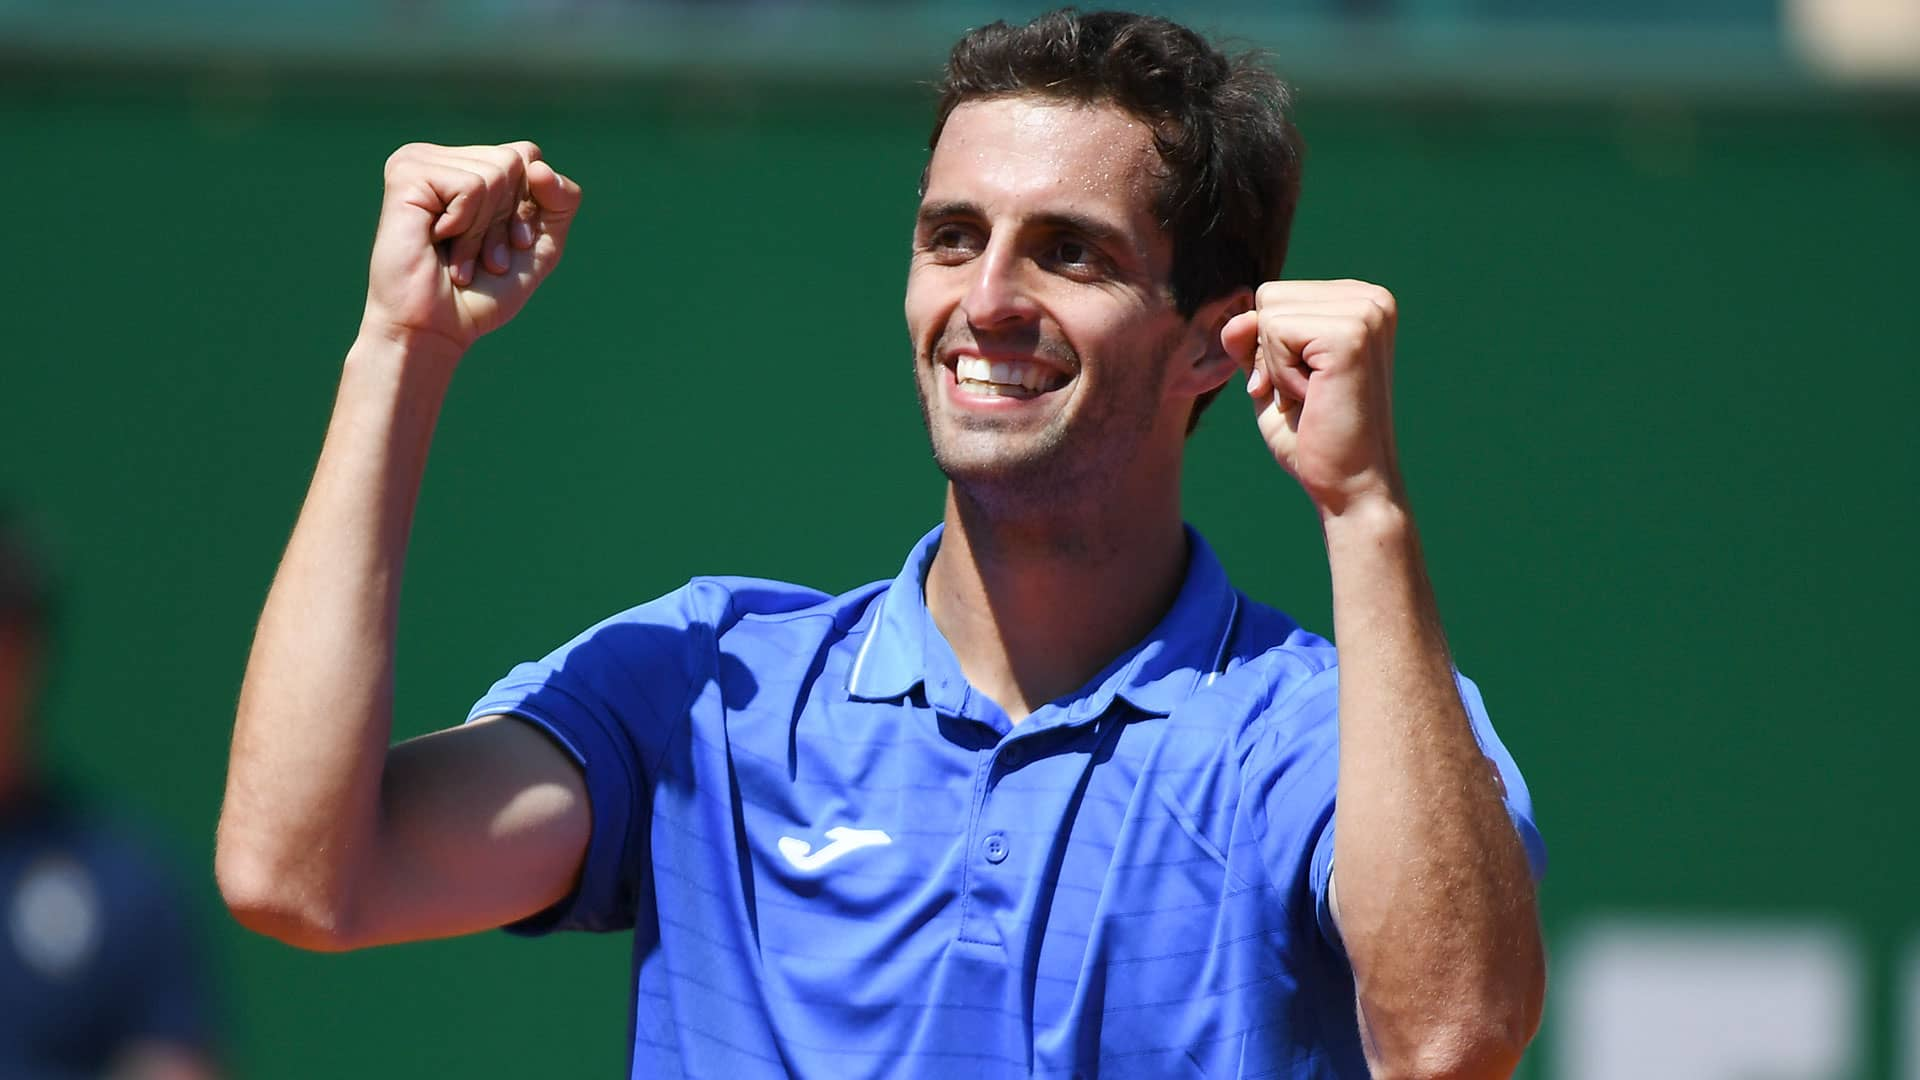 Andalucia Open 2021: Albert Ramos-Vinolas vs. Ricardas Berankis Tennis Pick and Prediction